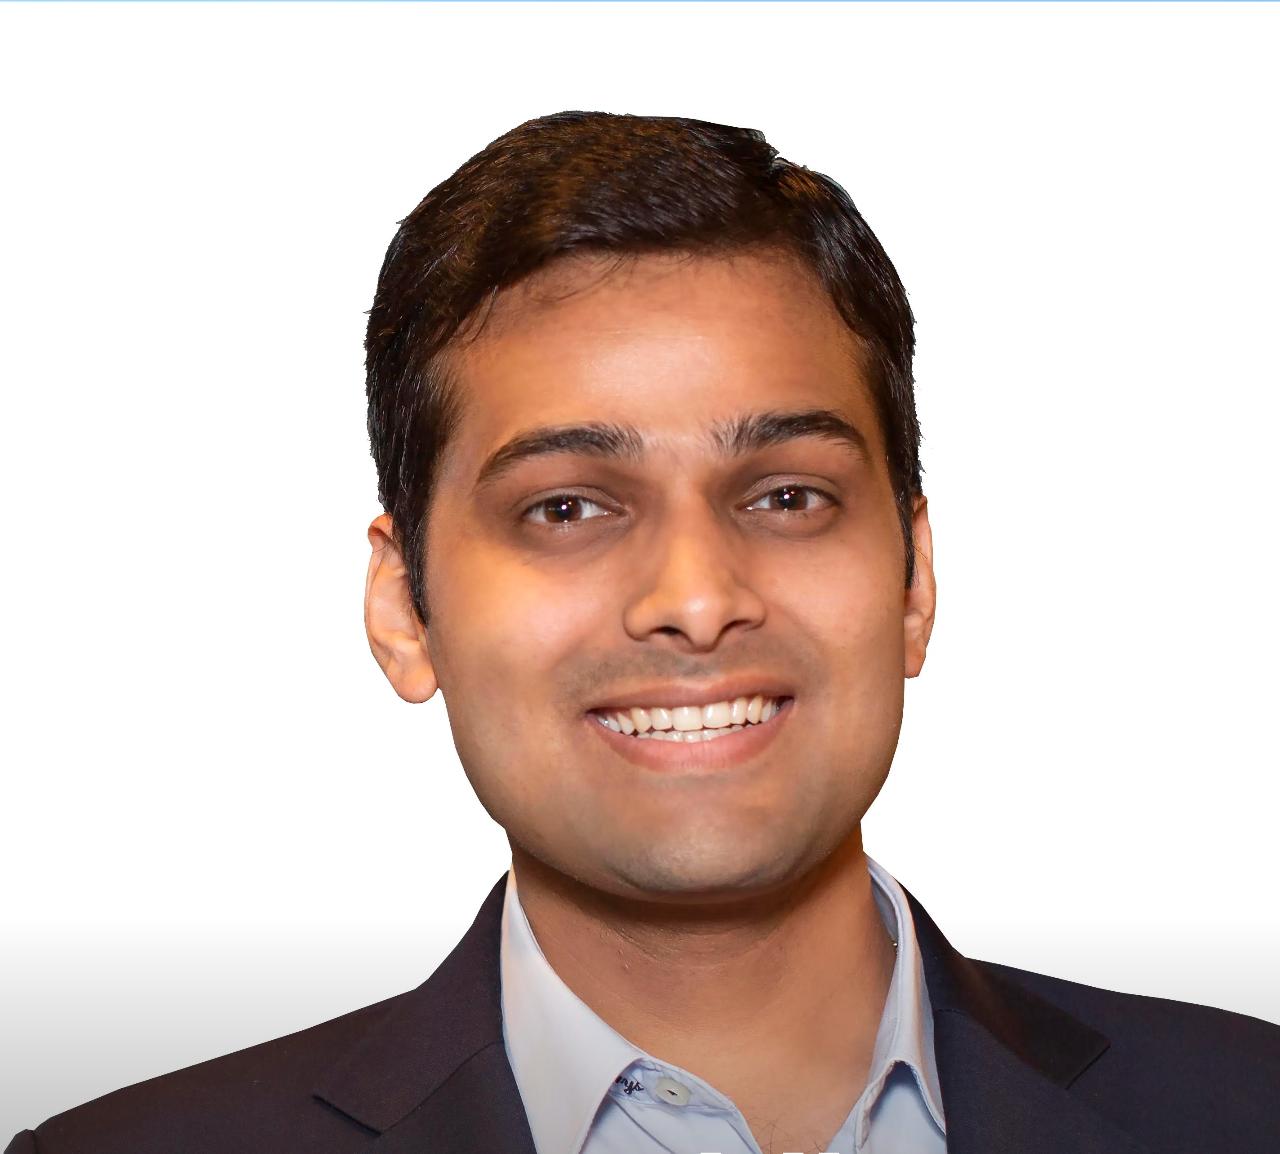 Headshot of Aniruddha Sharma, chief executive at carbon capture startup Carbon Clean.